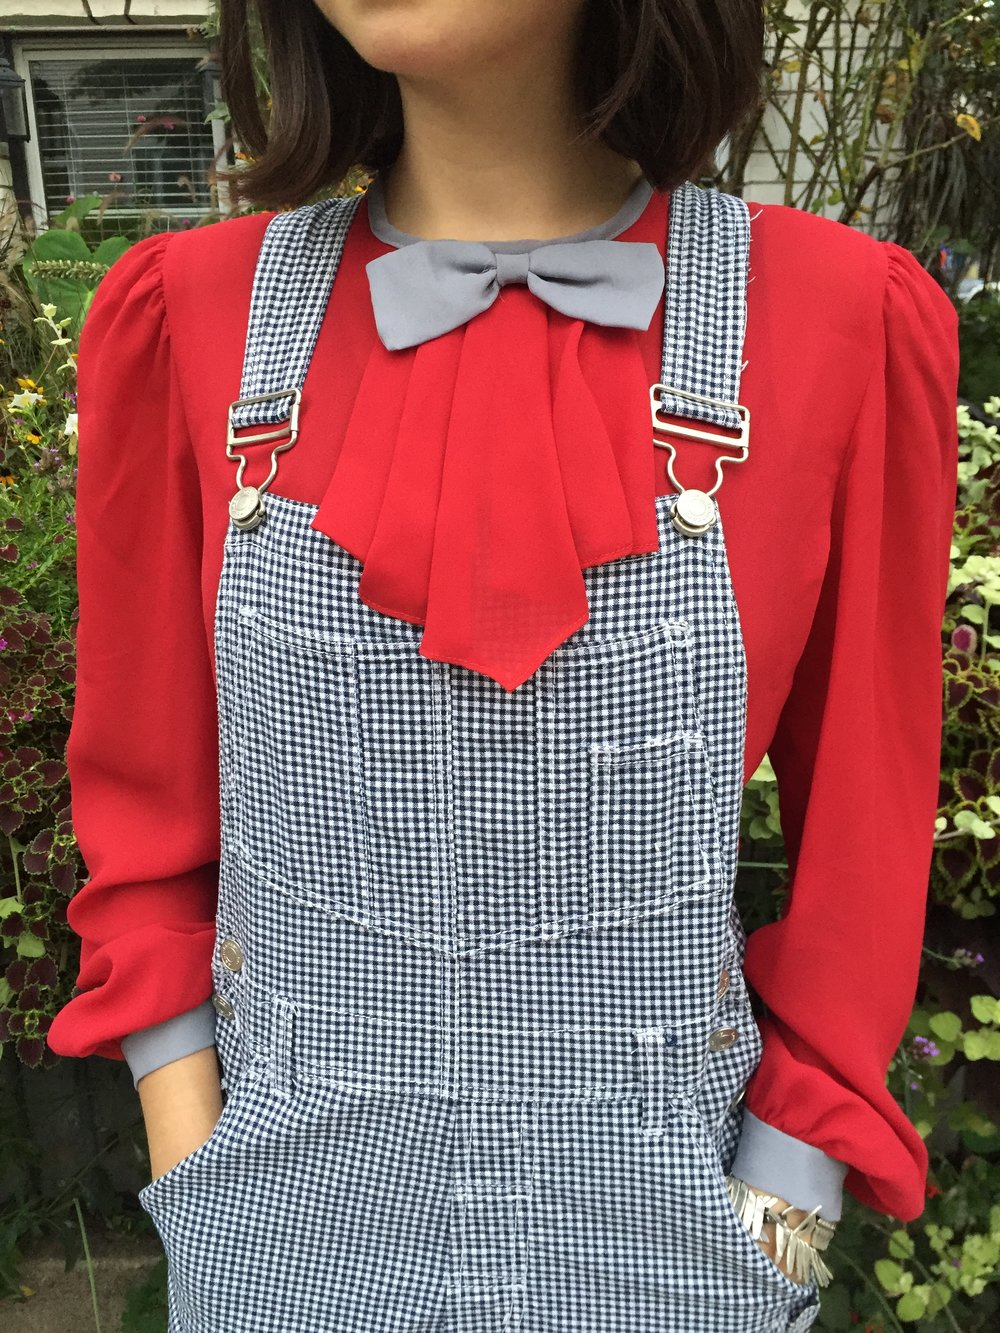 burgundy and gray kitten bow secretary blouse / bow tie top , vintage gingham shortalls / vintage denim shorts overalls